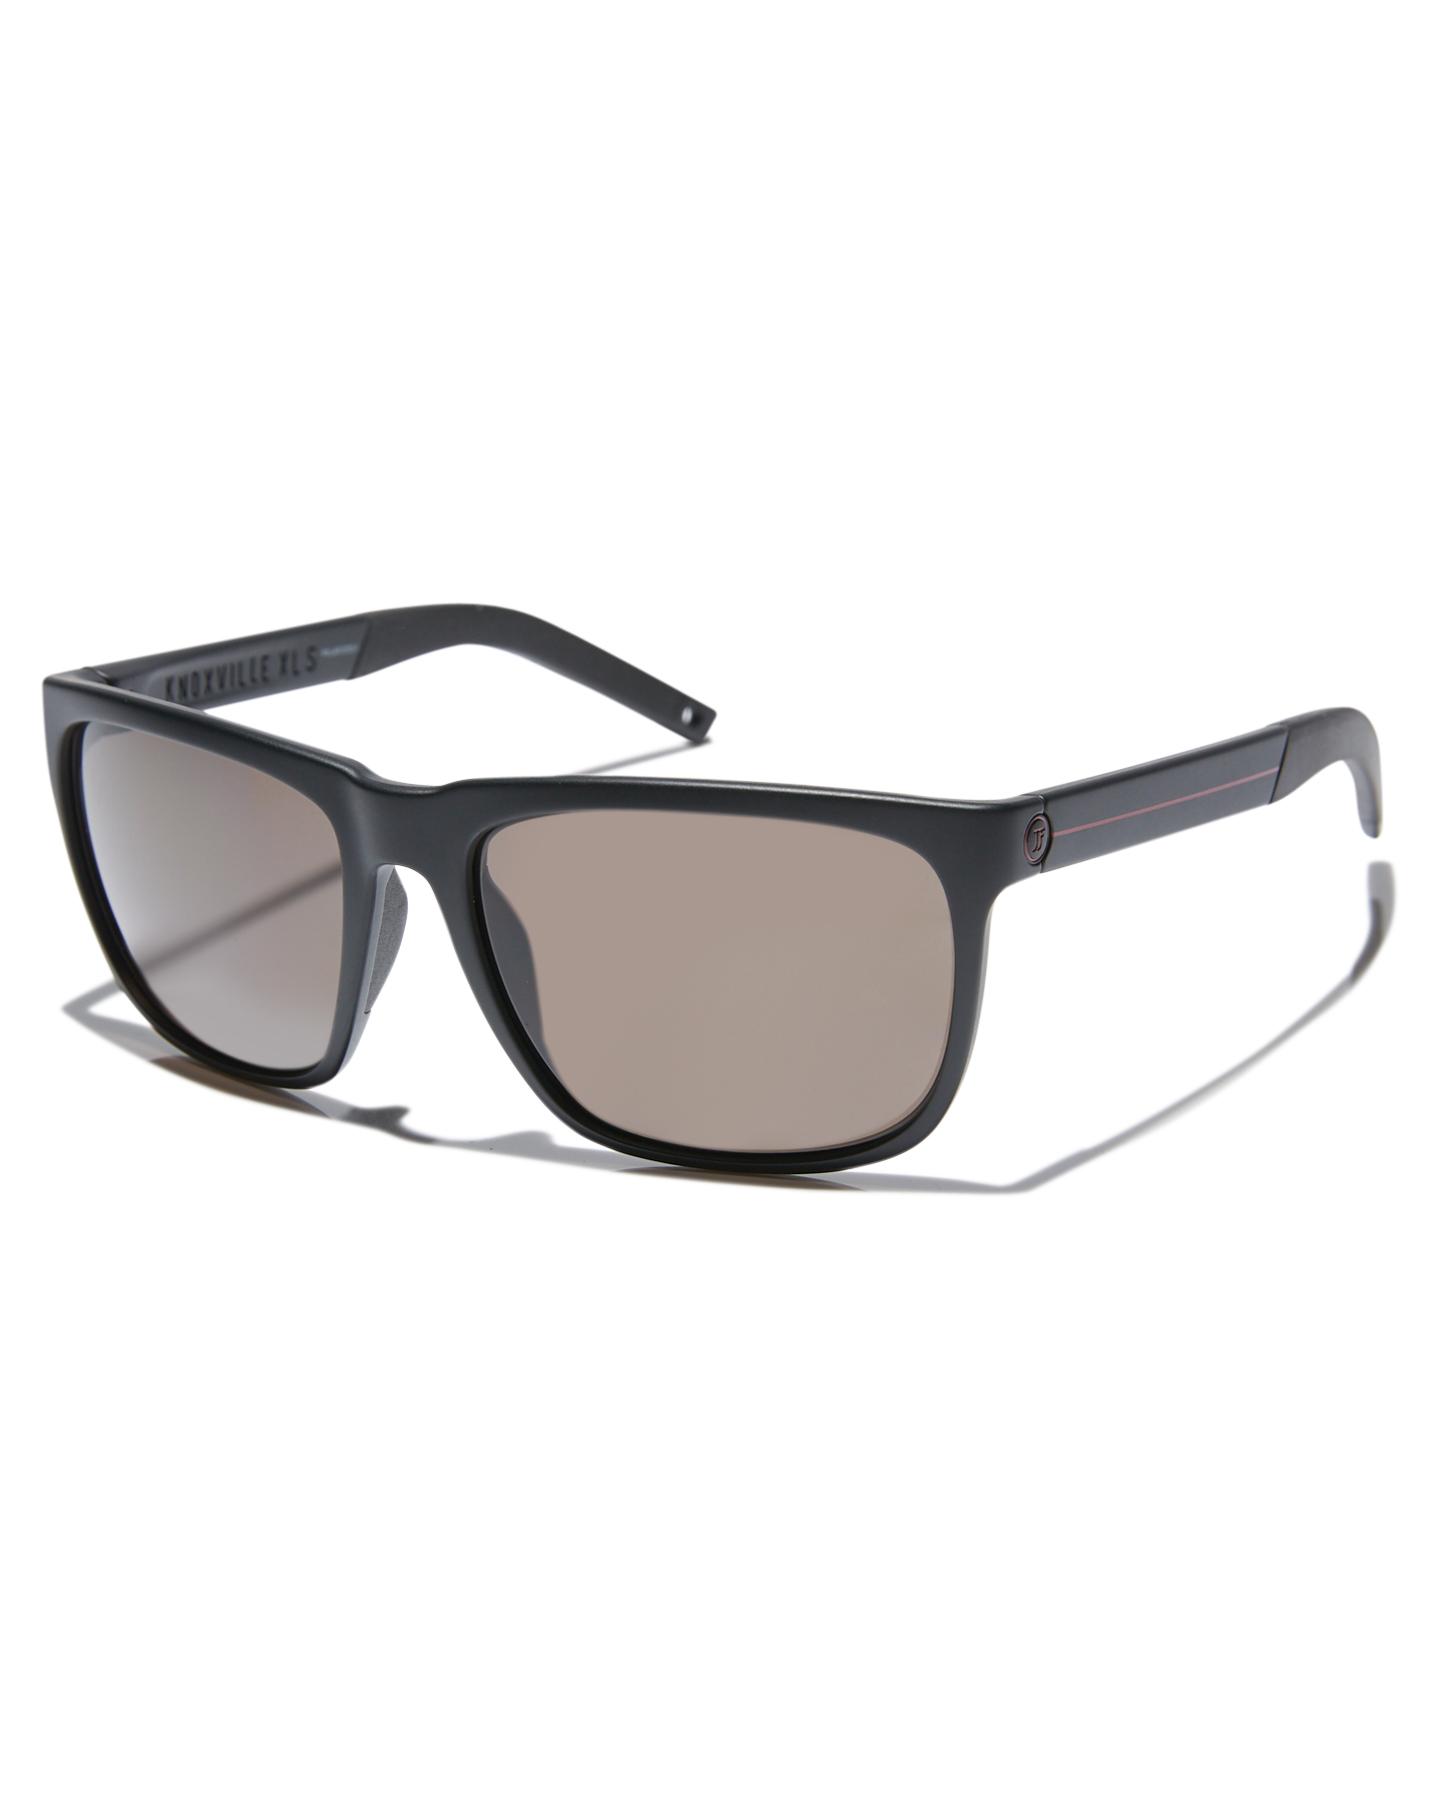 Electric Knoxville Xl S Jjf Polarized Sunglasses - Matte Blck Red ... 8924506ec3